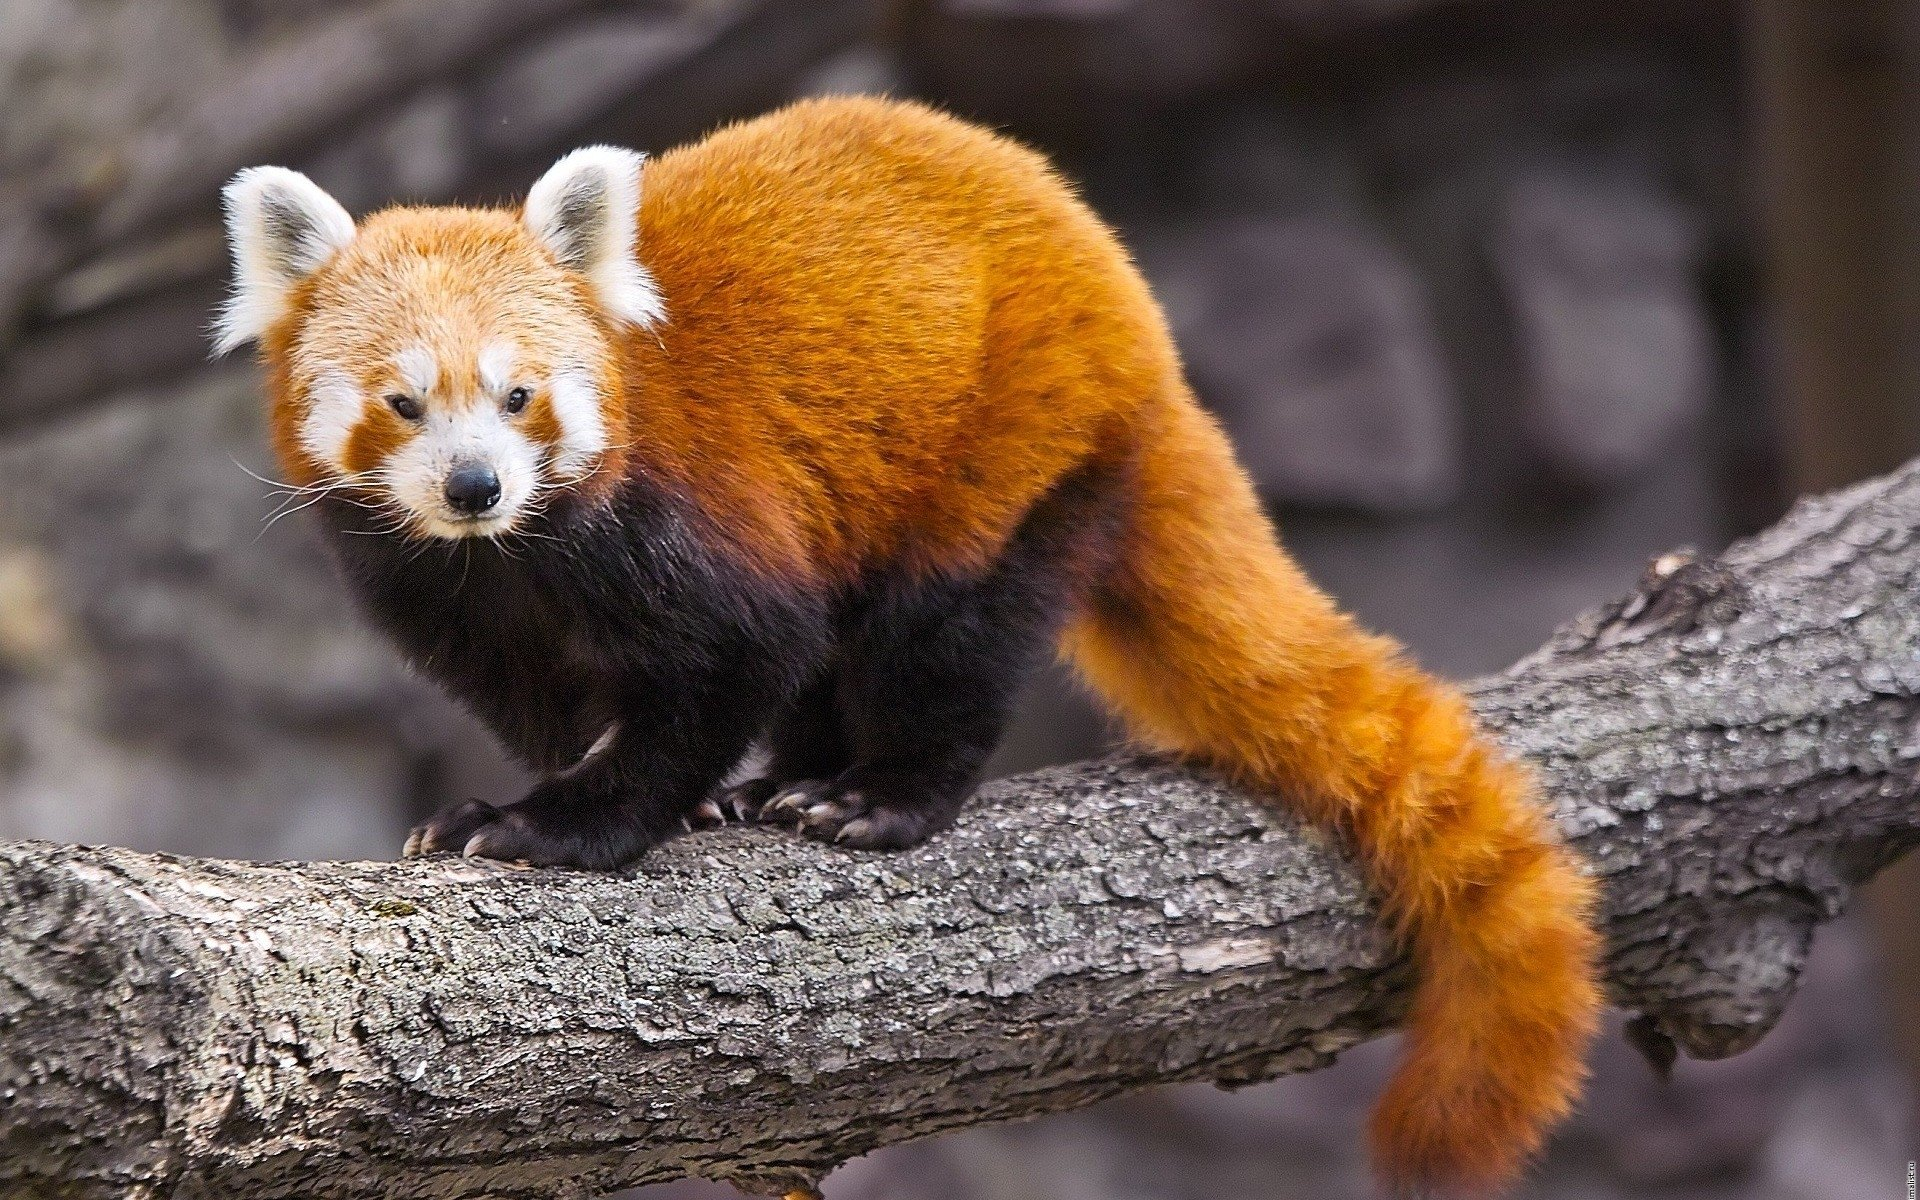 Panda Roux Full HD Fond d'écran and Arrière-plan | 1920x1200 | ID:419499